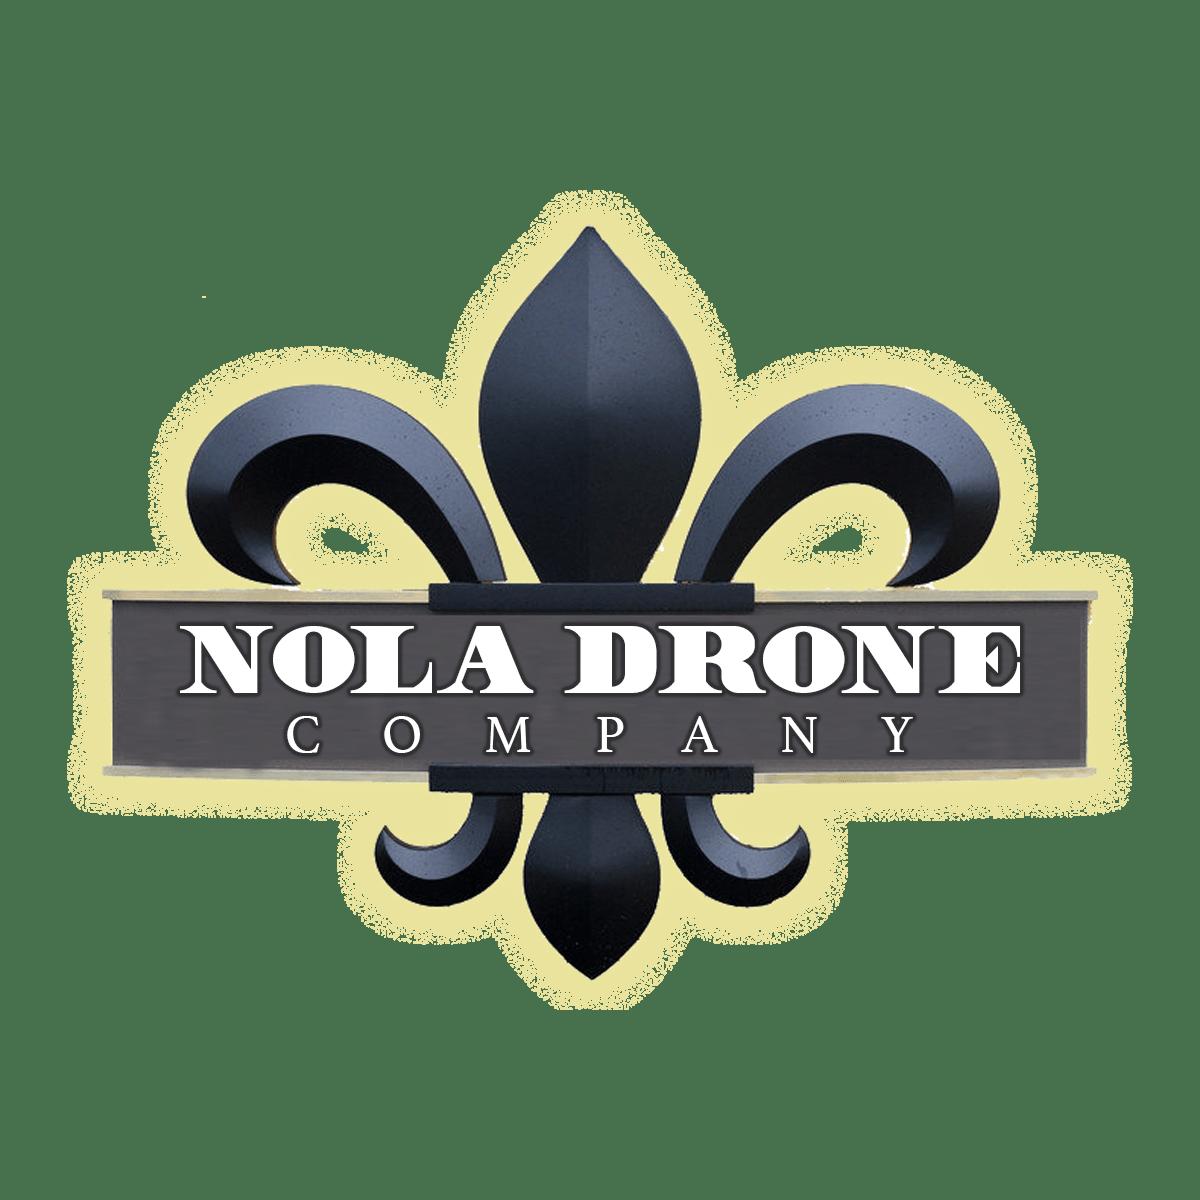 NOLA DRONE COMPANY primary image